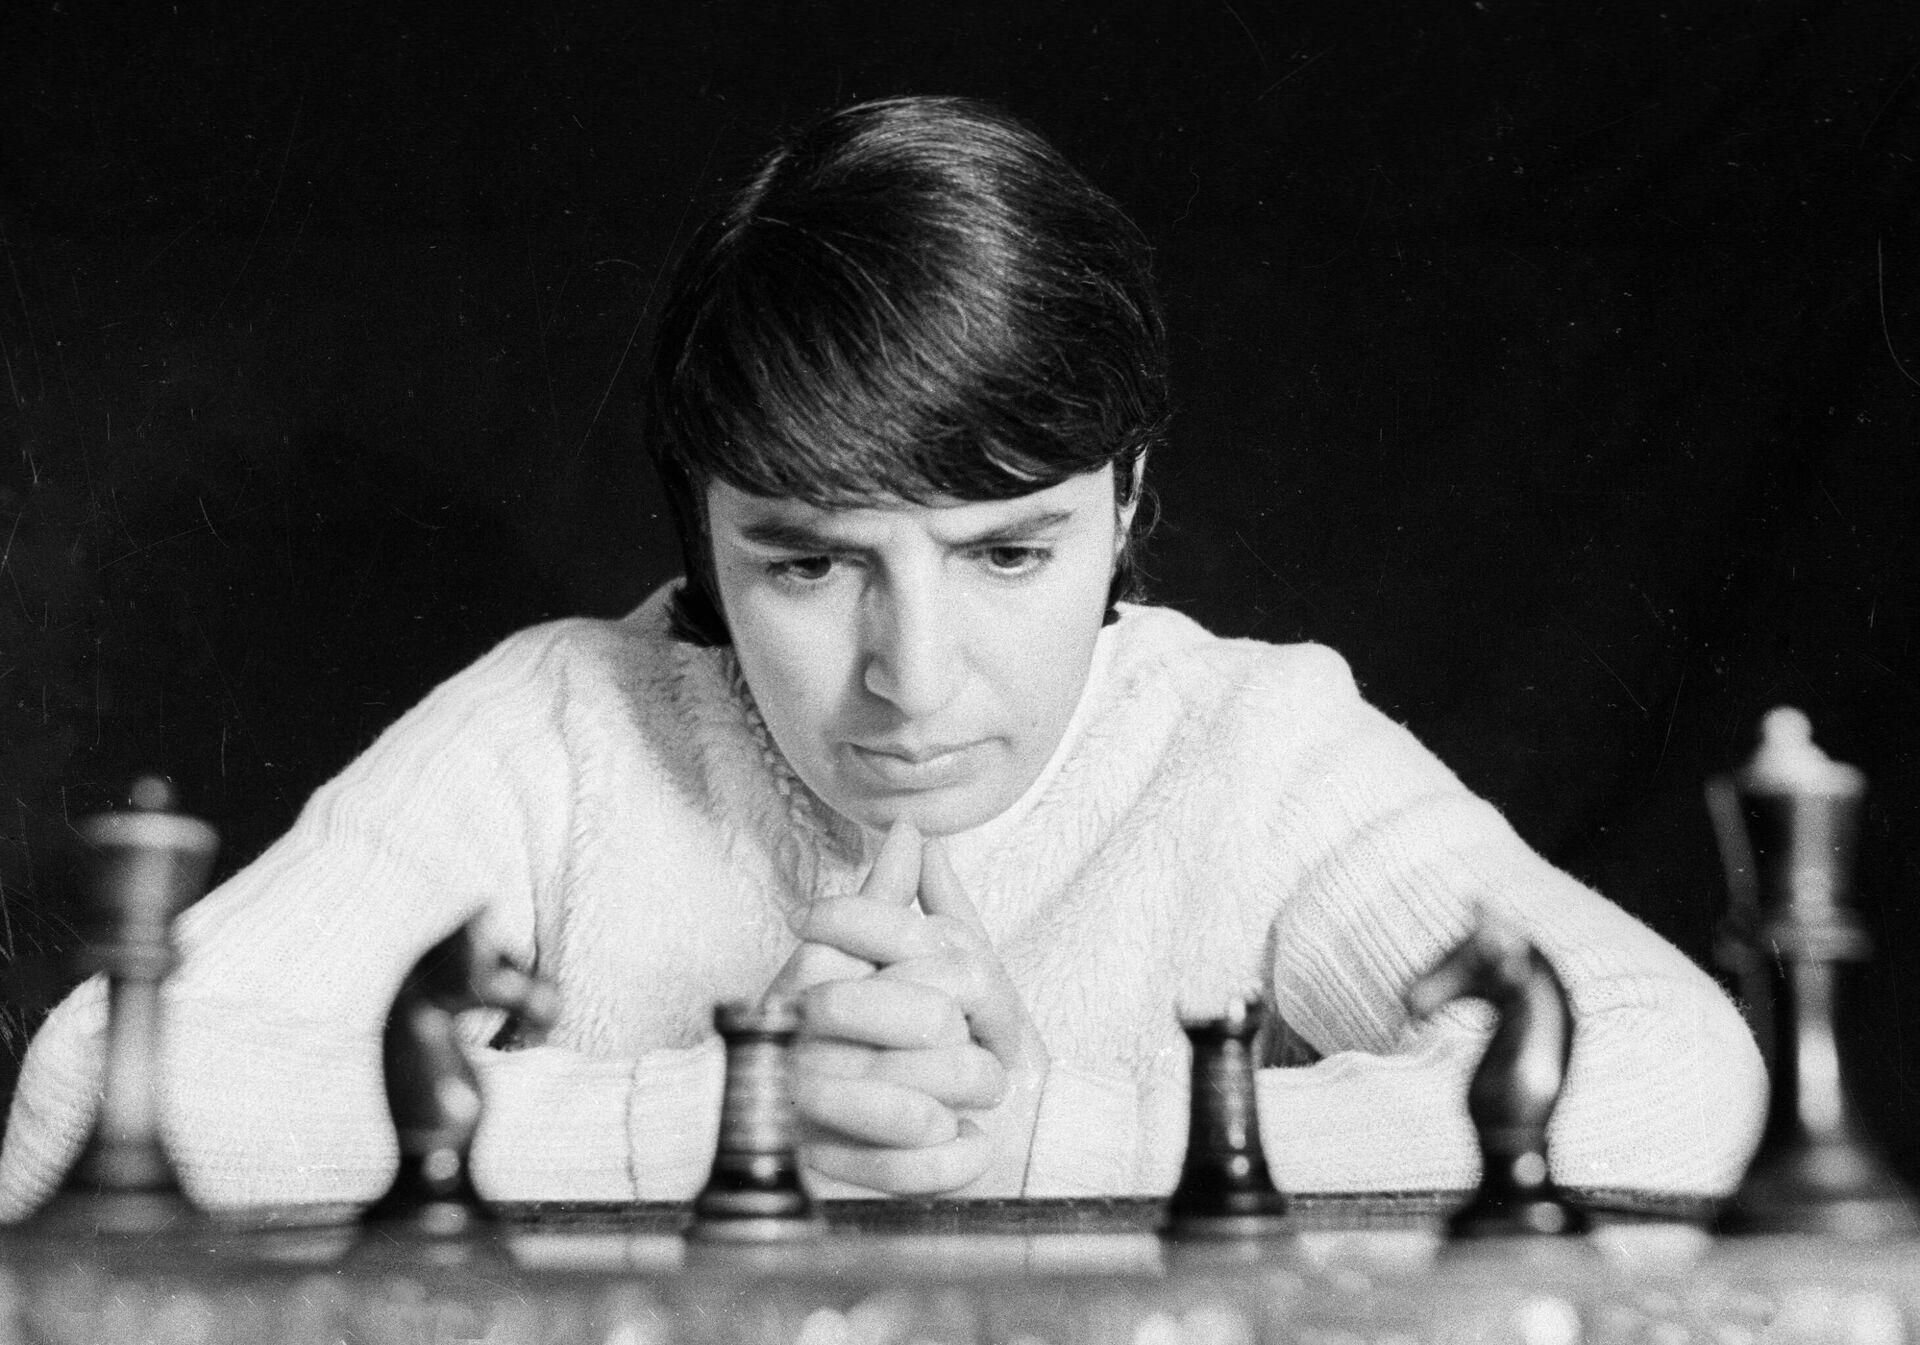 "1750495953 0:0:2922:2047 1920x0 80 0 0 9f2536720084d982c319d695329e88ff - Советская шахматистка подала в суд на создателей ""Хода королевы"""